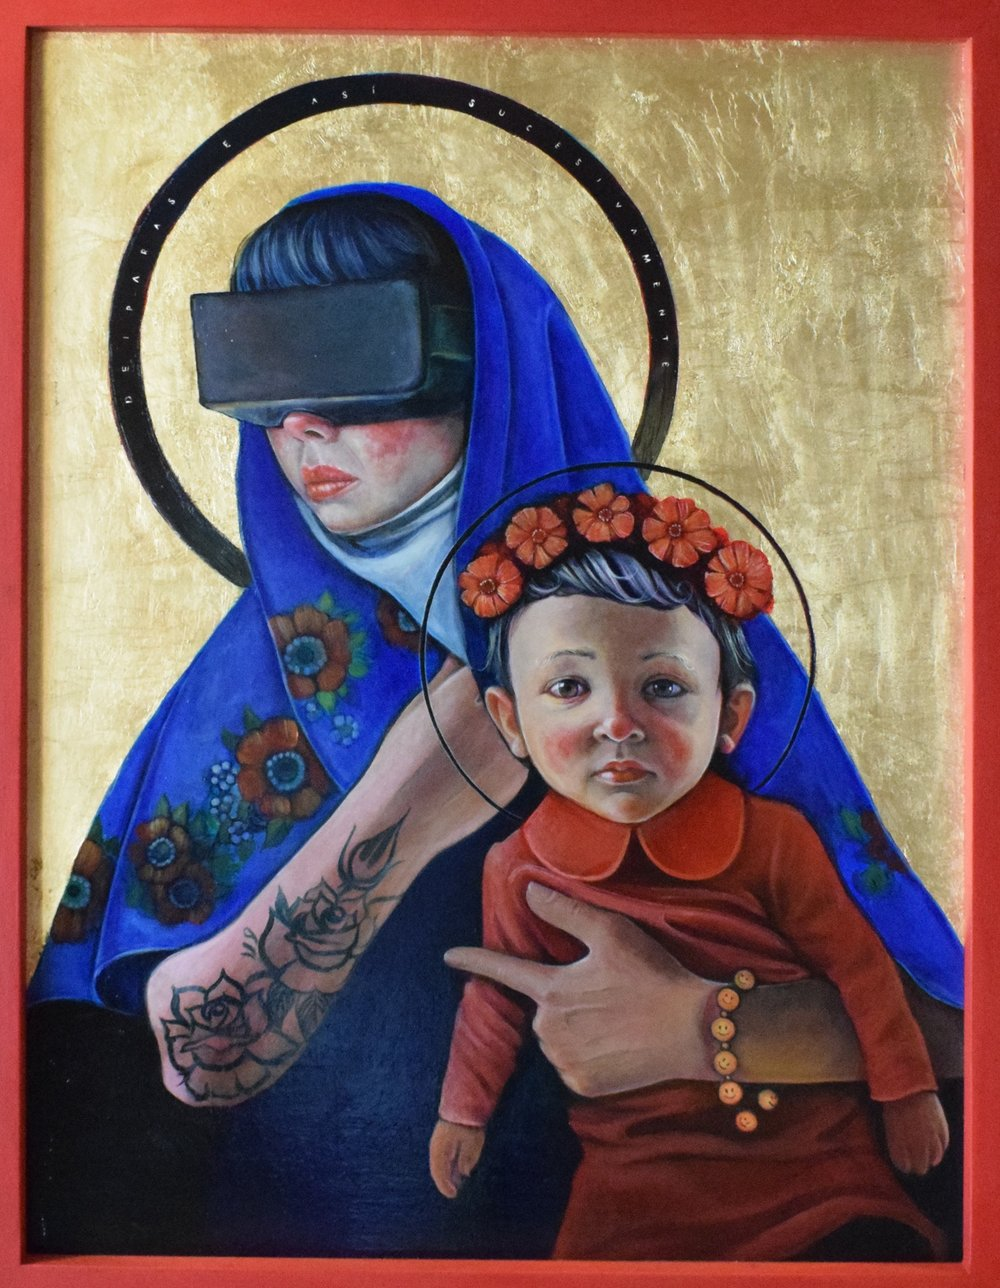 Natasha Lelenco, Deíparas, Acrylic and gold leaf on canvas board, 90 x 70cm x 4 cm,  https://www.natashalelenco.com/